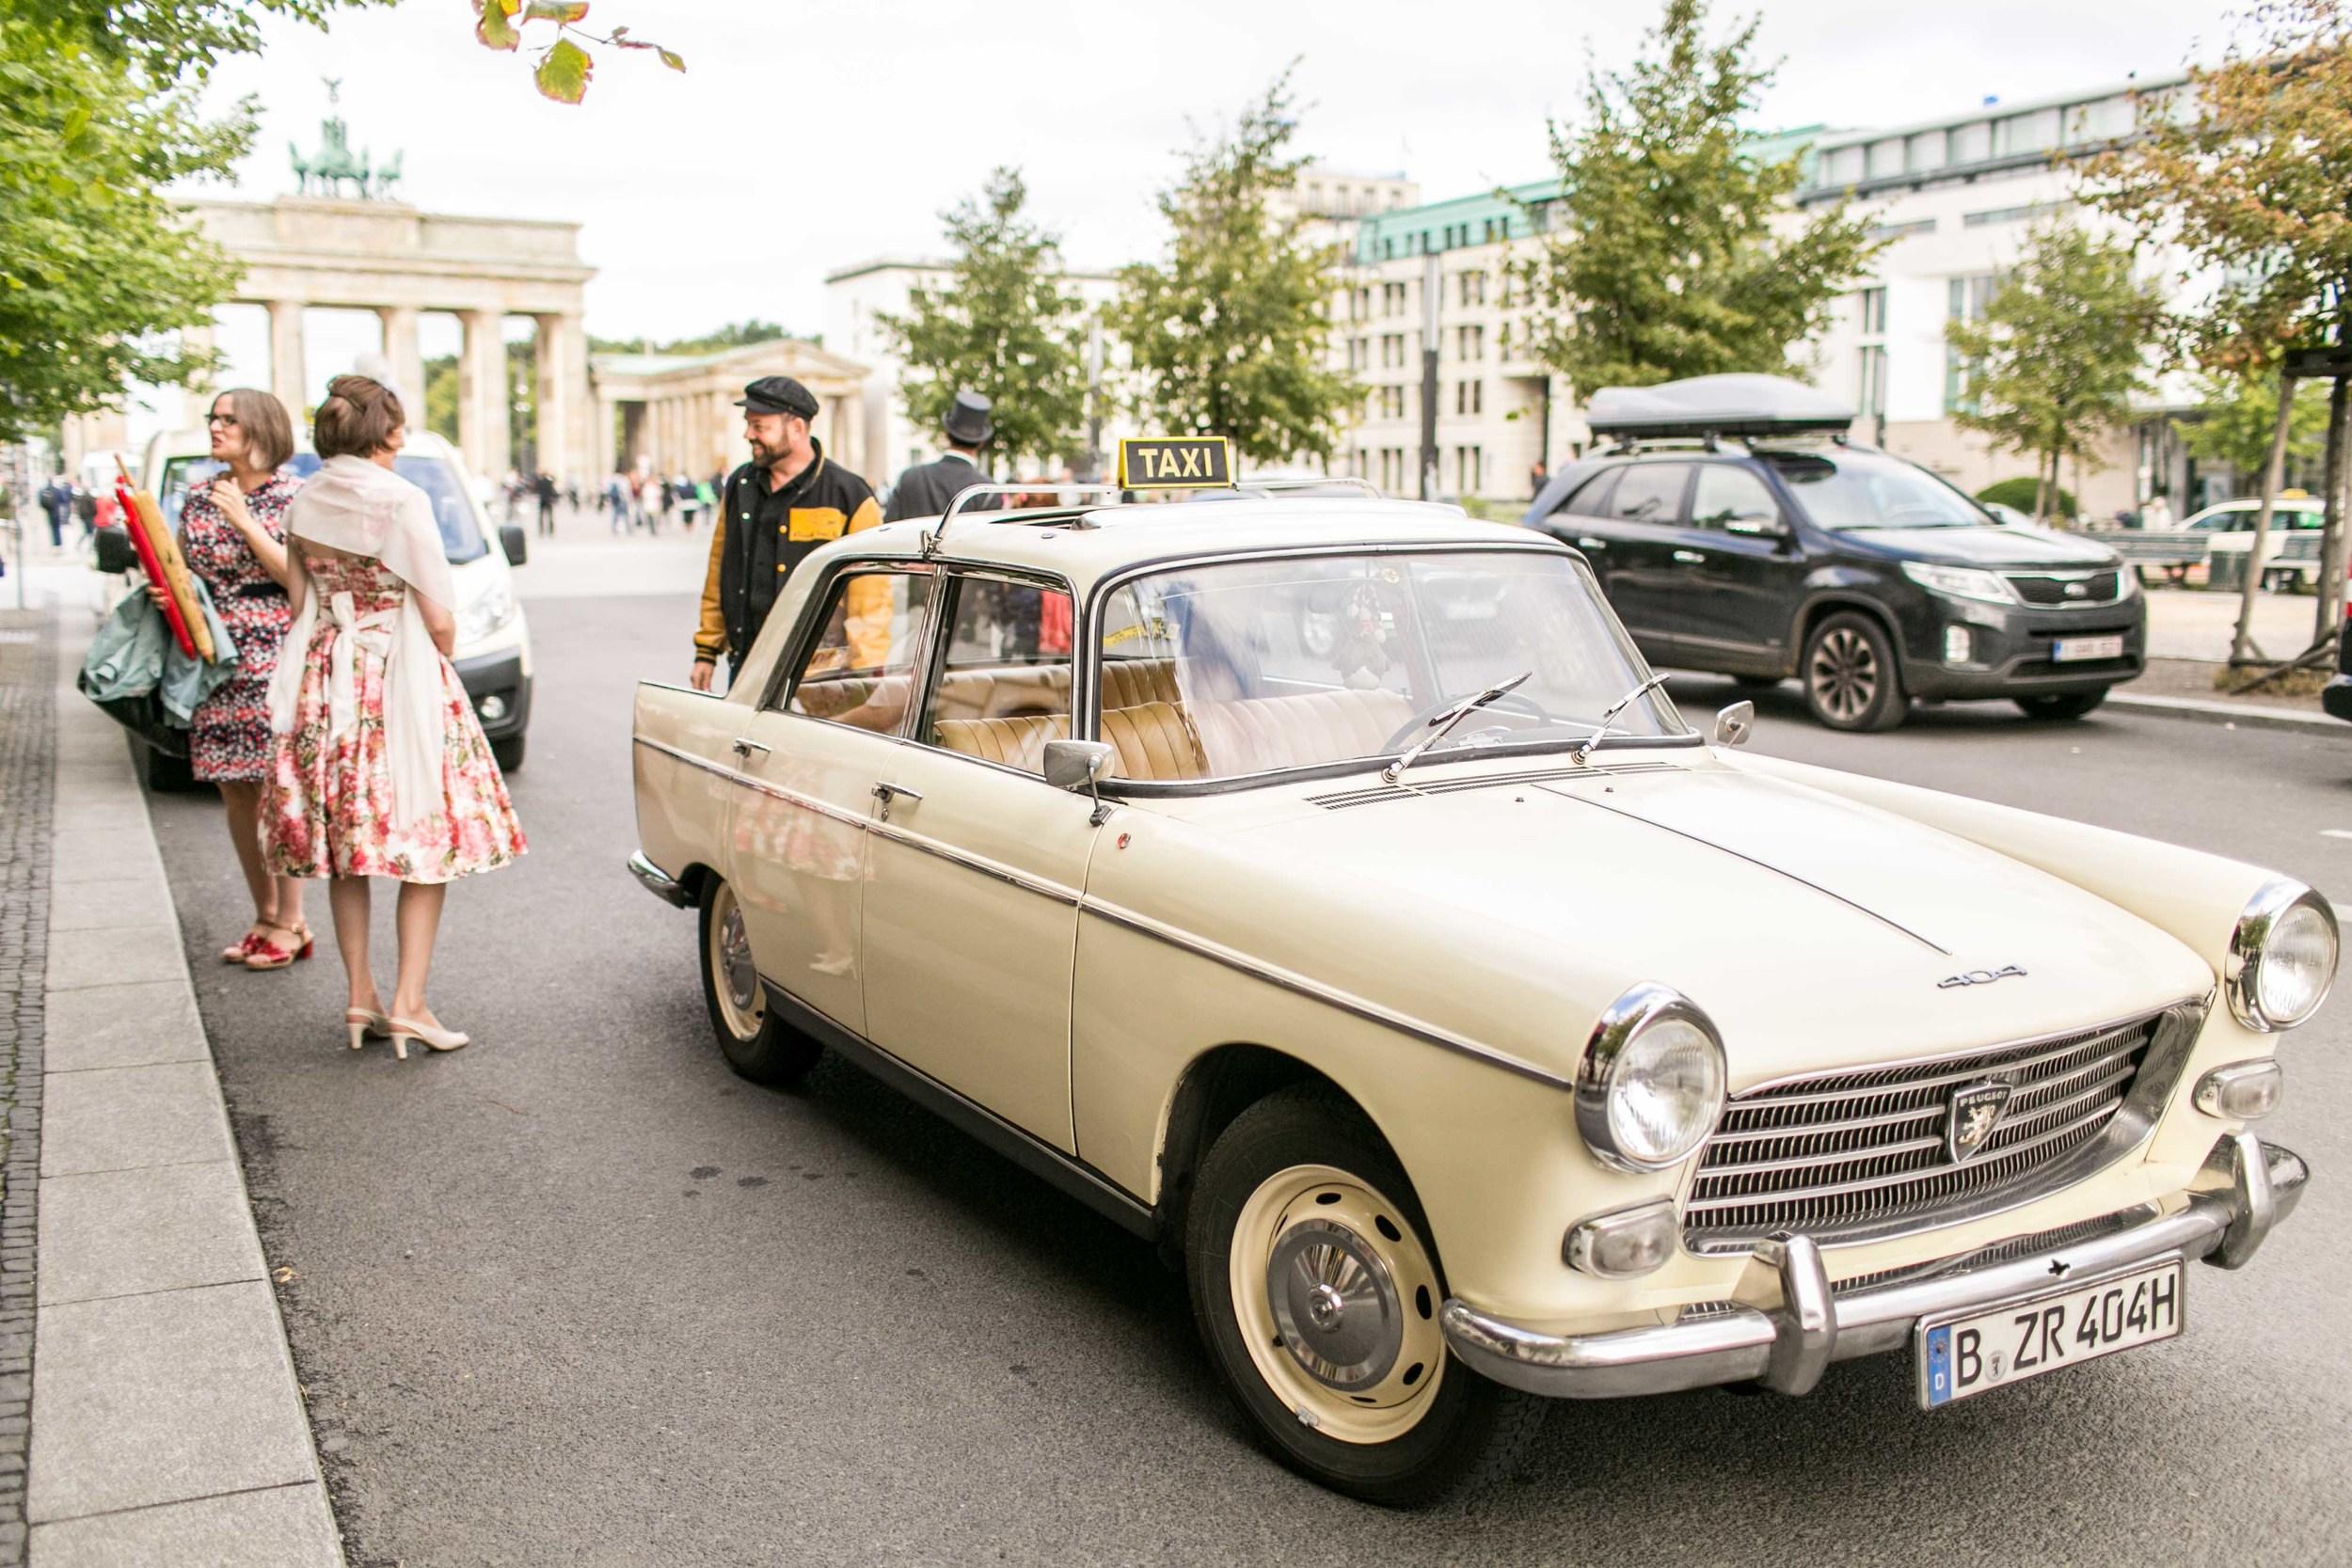 Fran Burrows Hochzeitsfotografie Berlin_Hotel Adlon-35.jpg